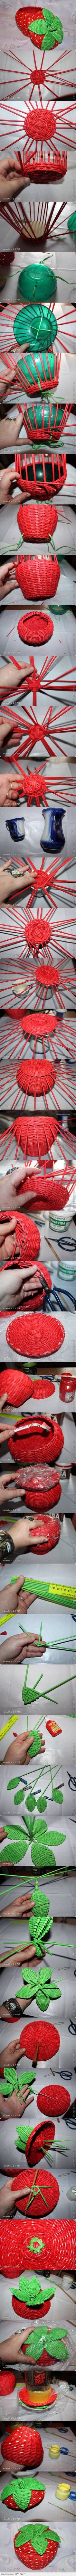 DIY Strawberry Bowl DIY Projects | UsefulDIY.com na Stylowi.pl